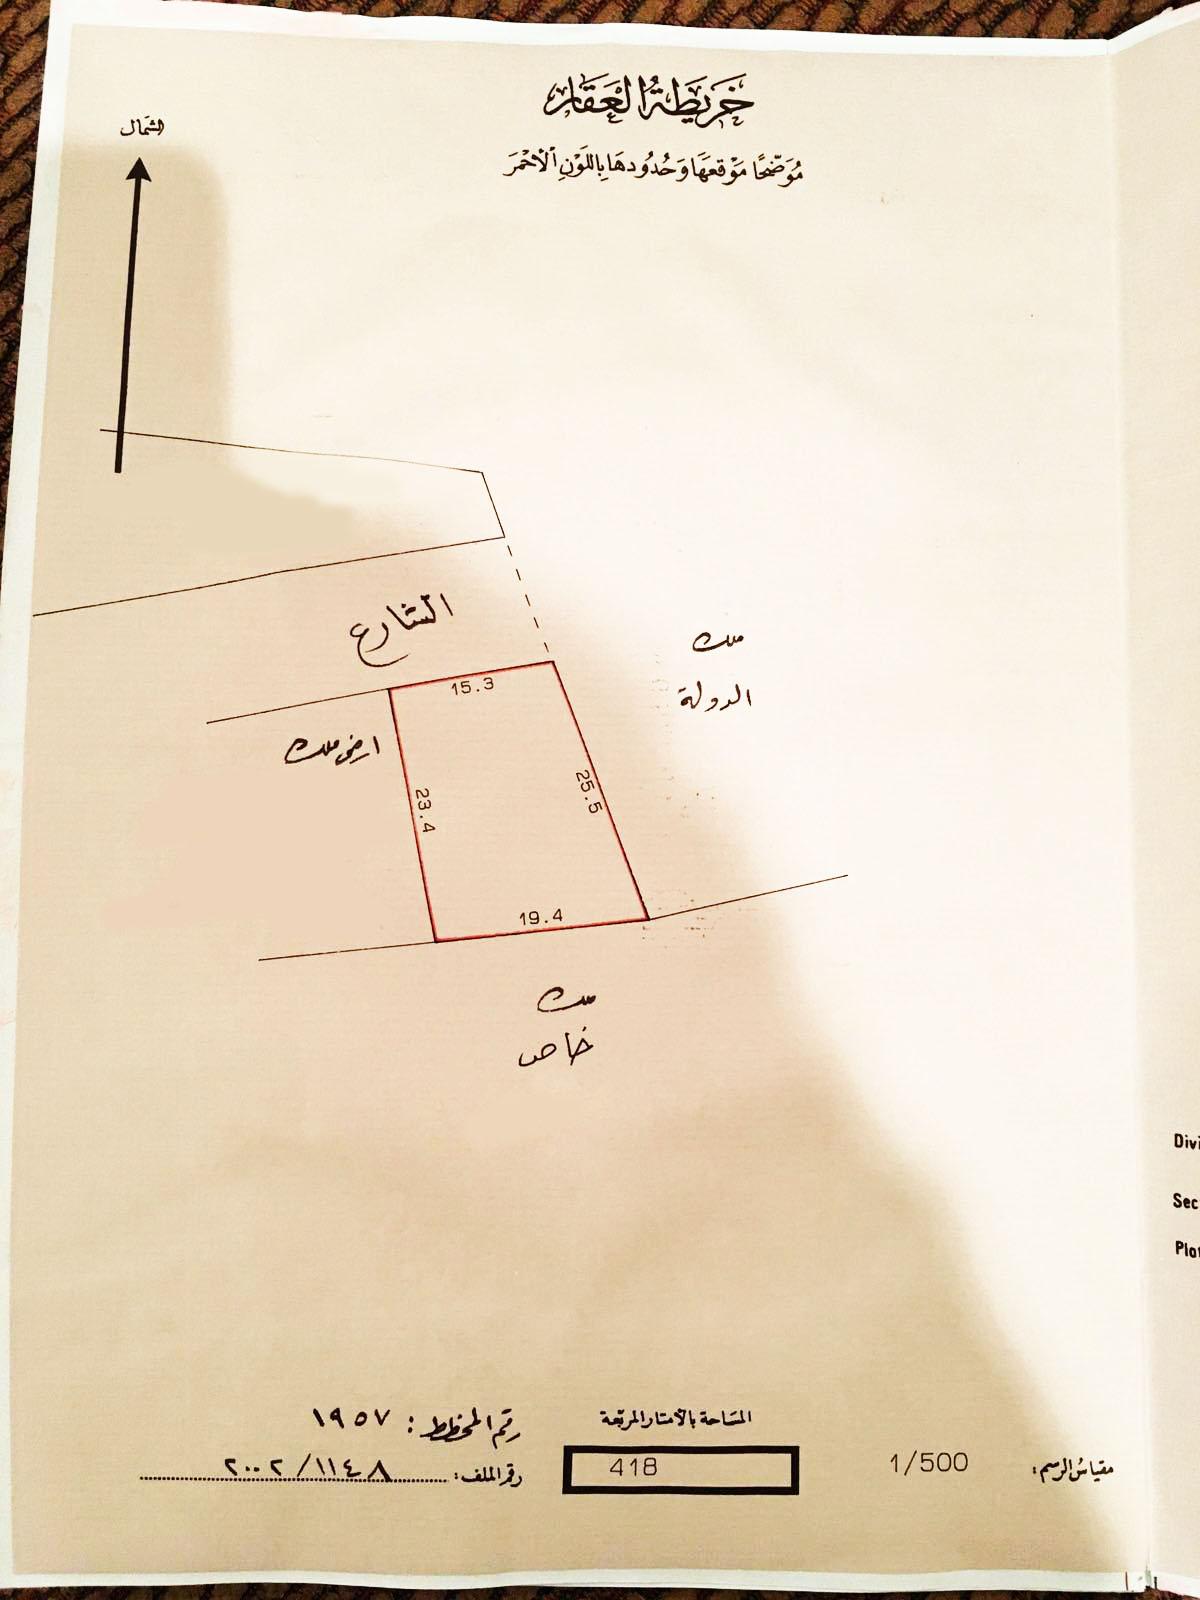 For Sale Land residential in Jid Ali Ref: JDA-AS-002